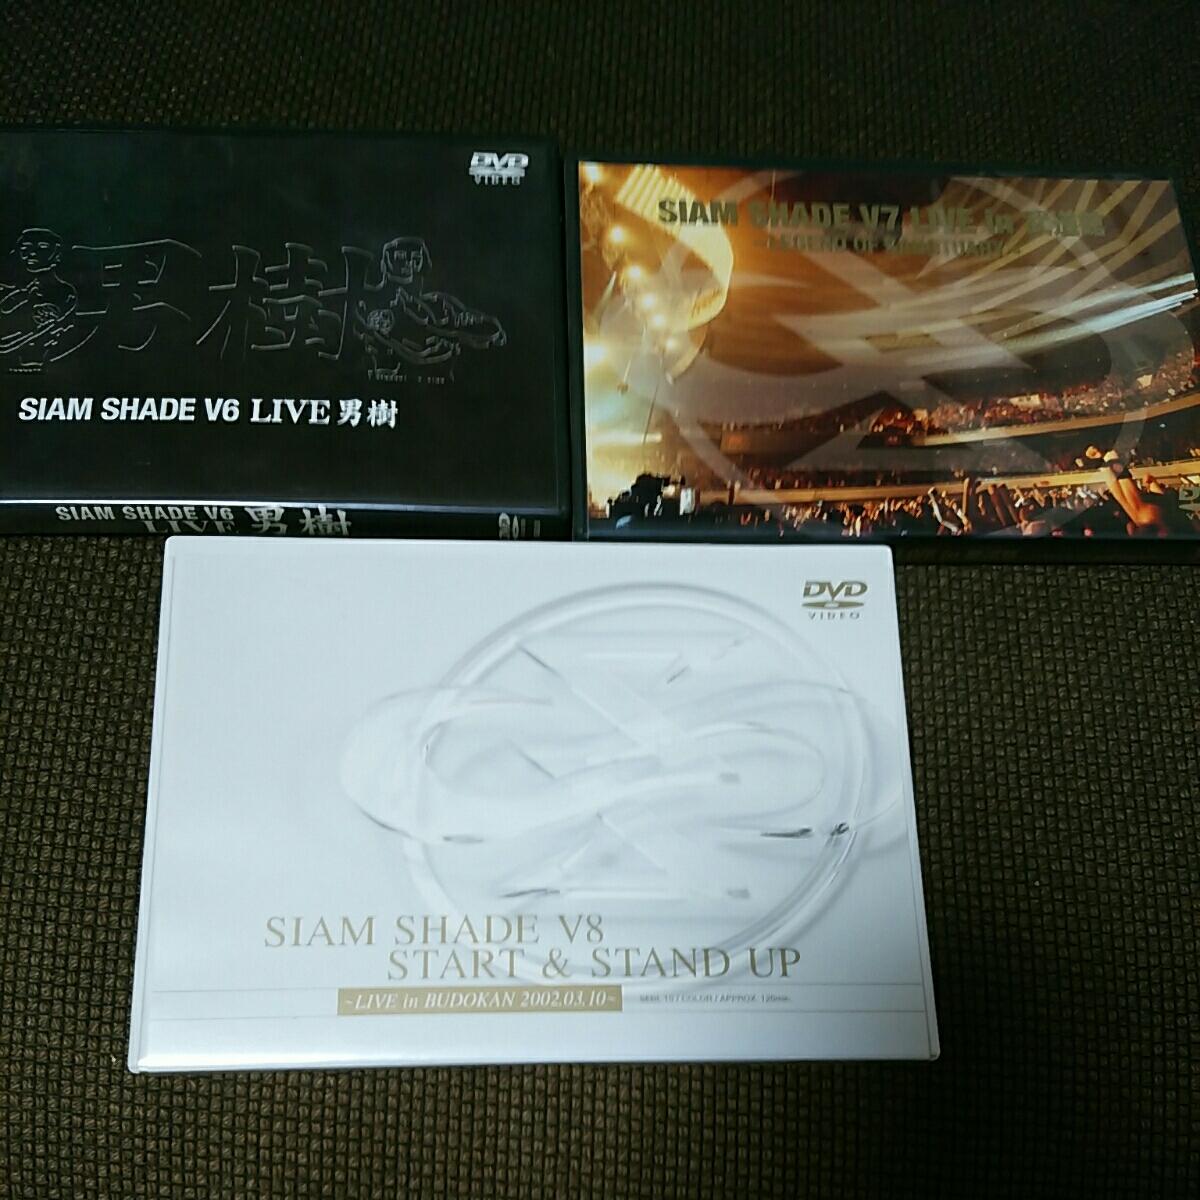 SIAM SHADE LIVE DVD 3枚セット★V6 男樹、V7~LEGEND OF SANCTUARY~、V8 START&STAND UP★中古 シャムシェイド コンサートグッズの画像